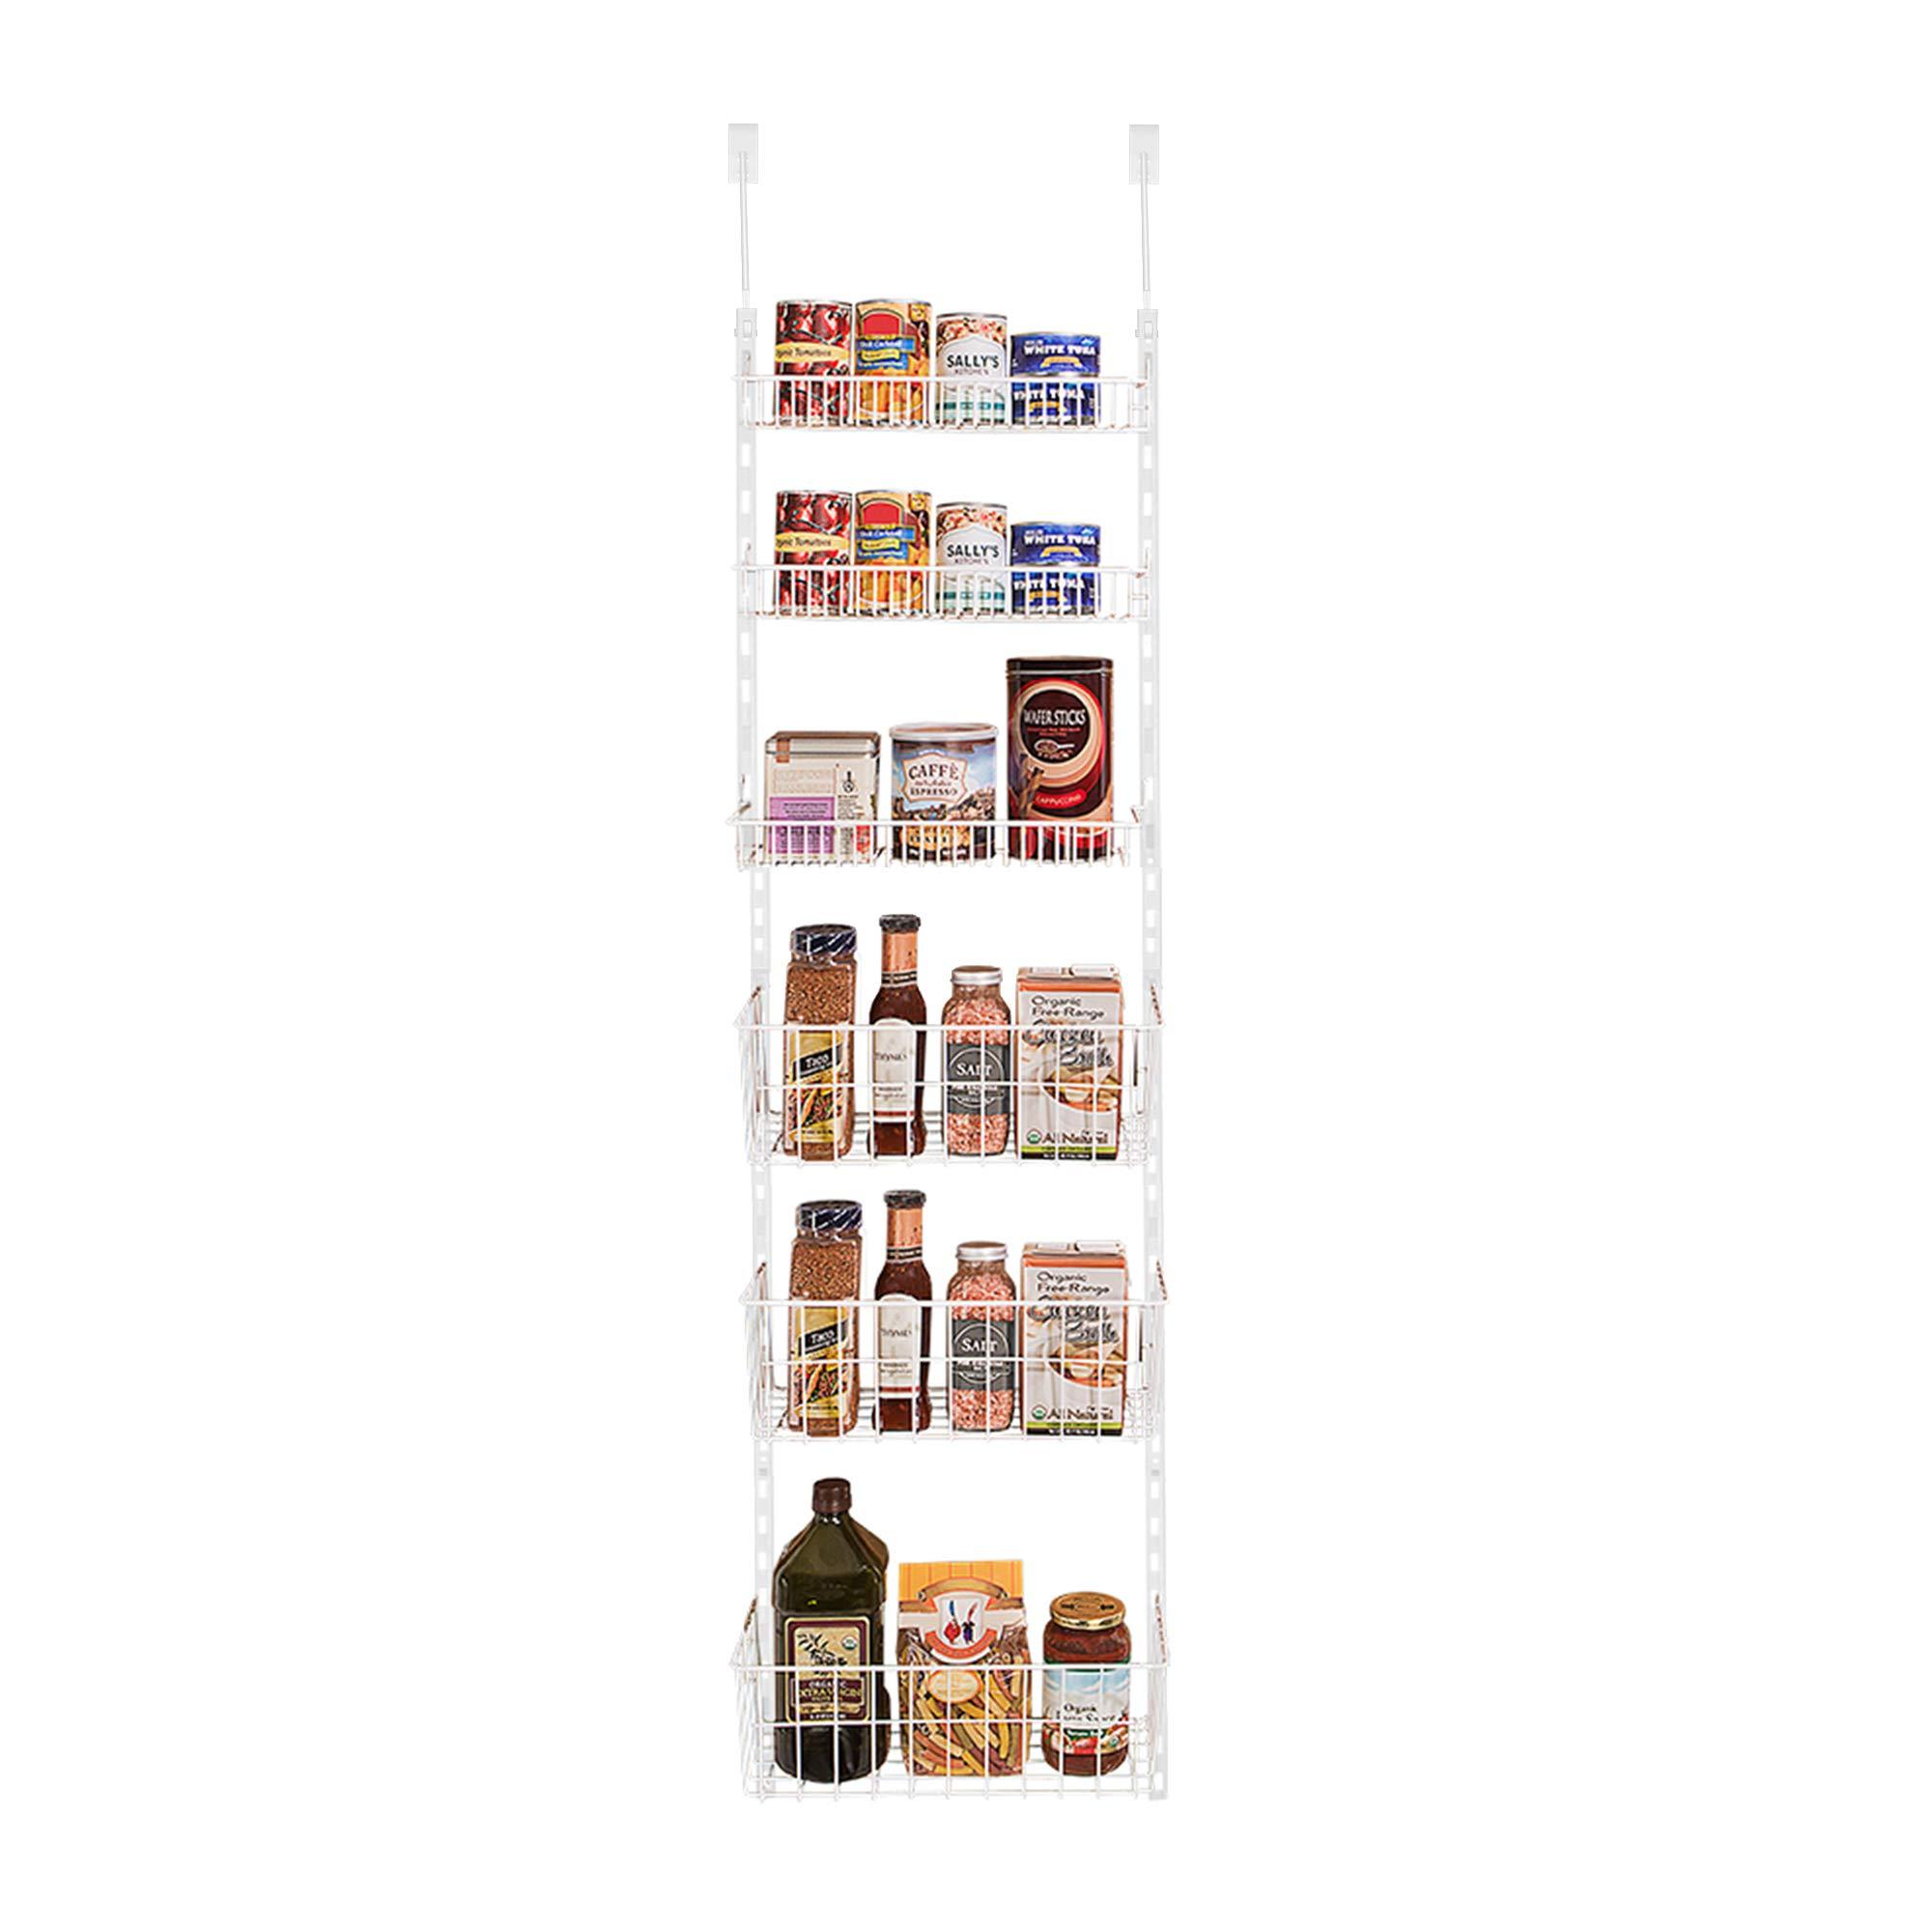 Smart Design Over The Door Adjustable Pantry Organizer Rack w/ 6 Adjustable Shelves - PE Dip - Steel Metal Construction w/Hooks & Screws - Cans, Food, Misc. Item - Kitchen (17 x 55.25 Inch) [White] by Smart Design